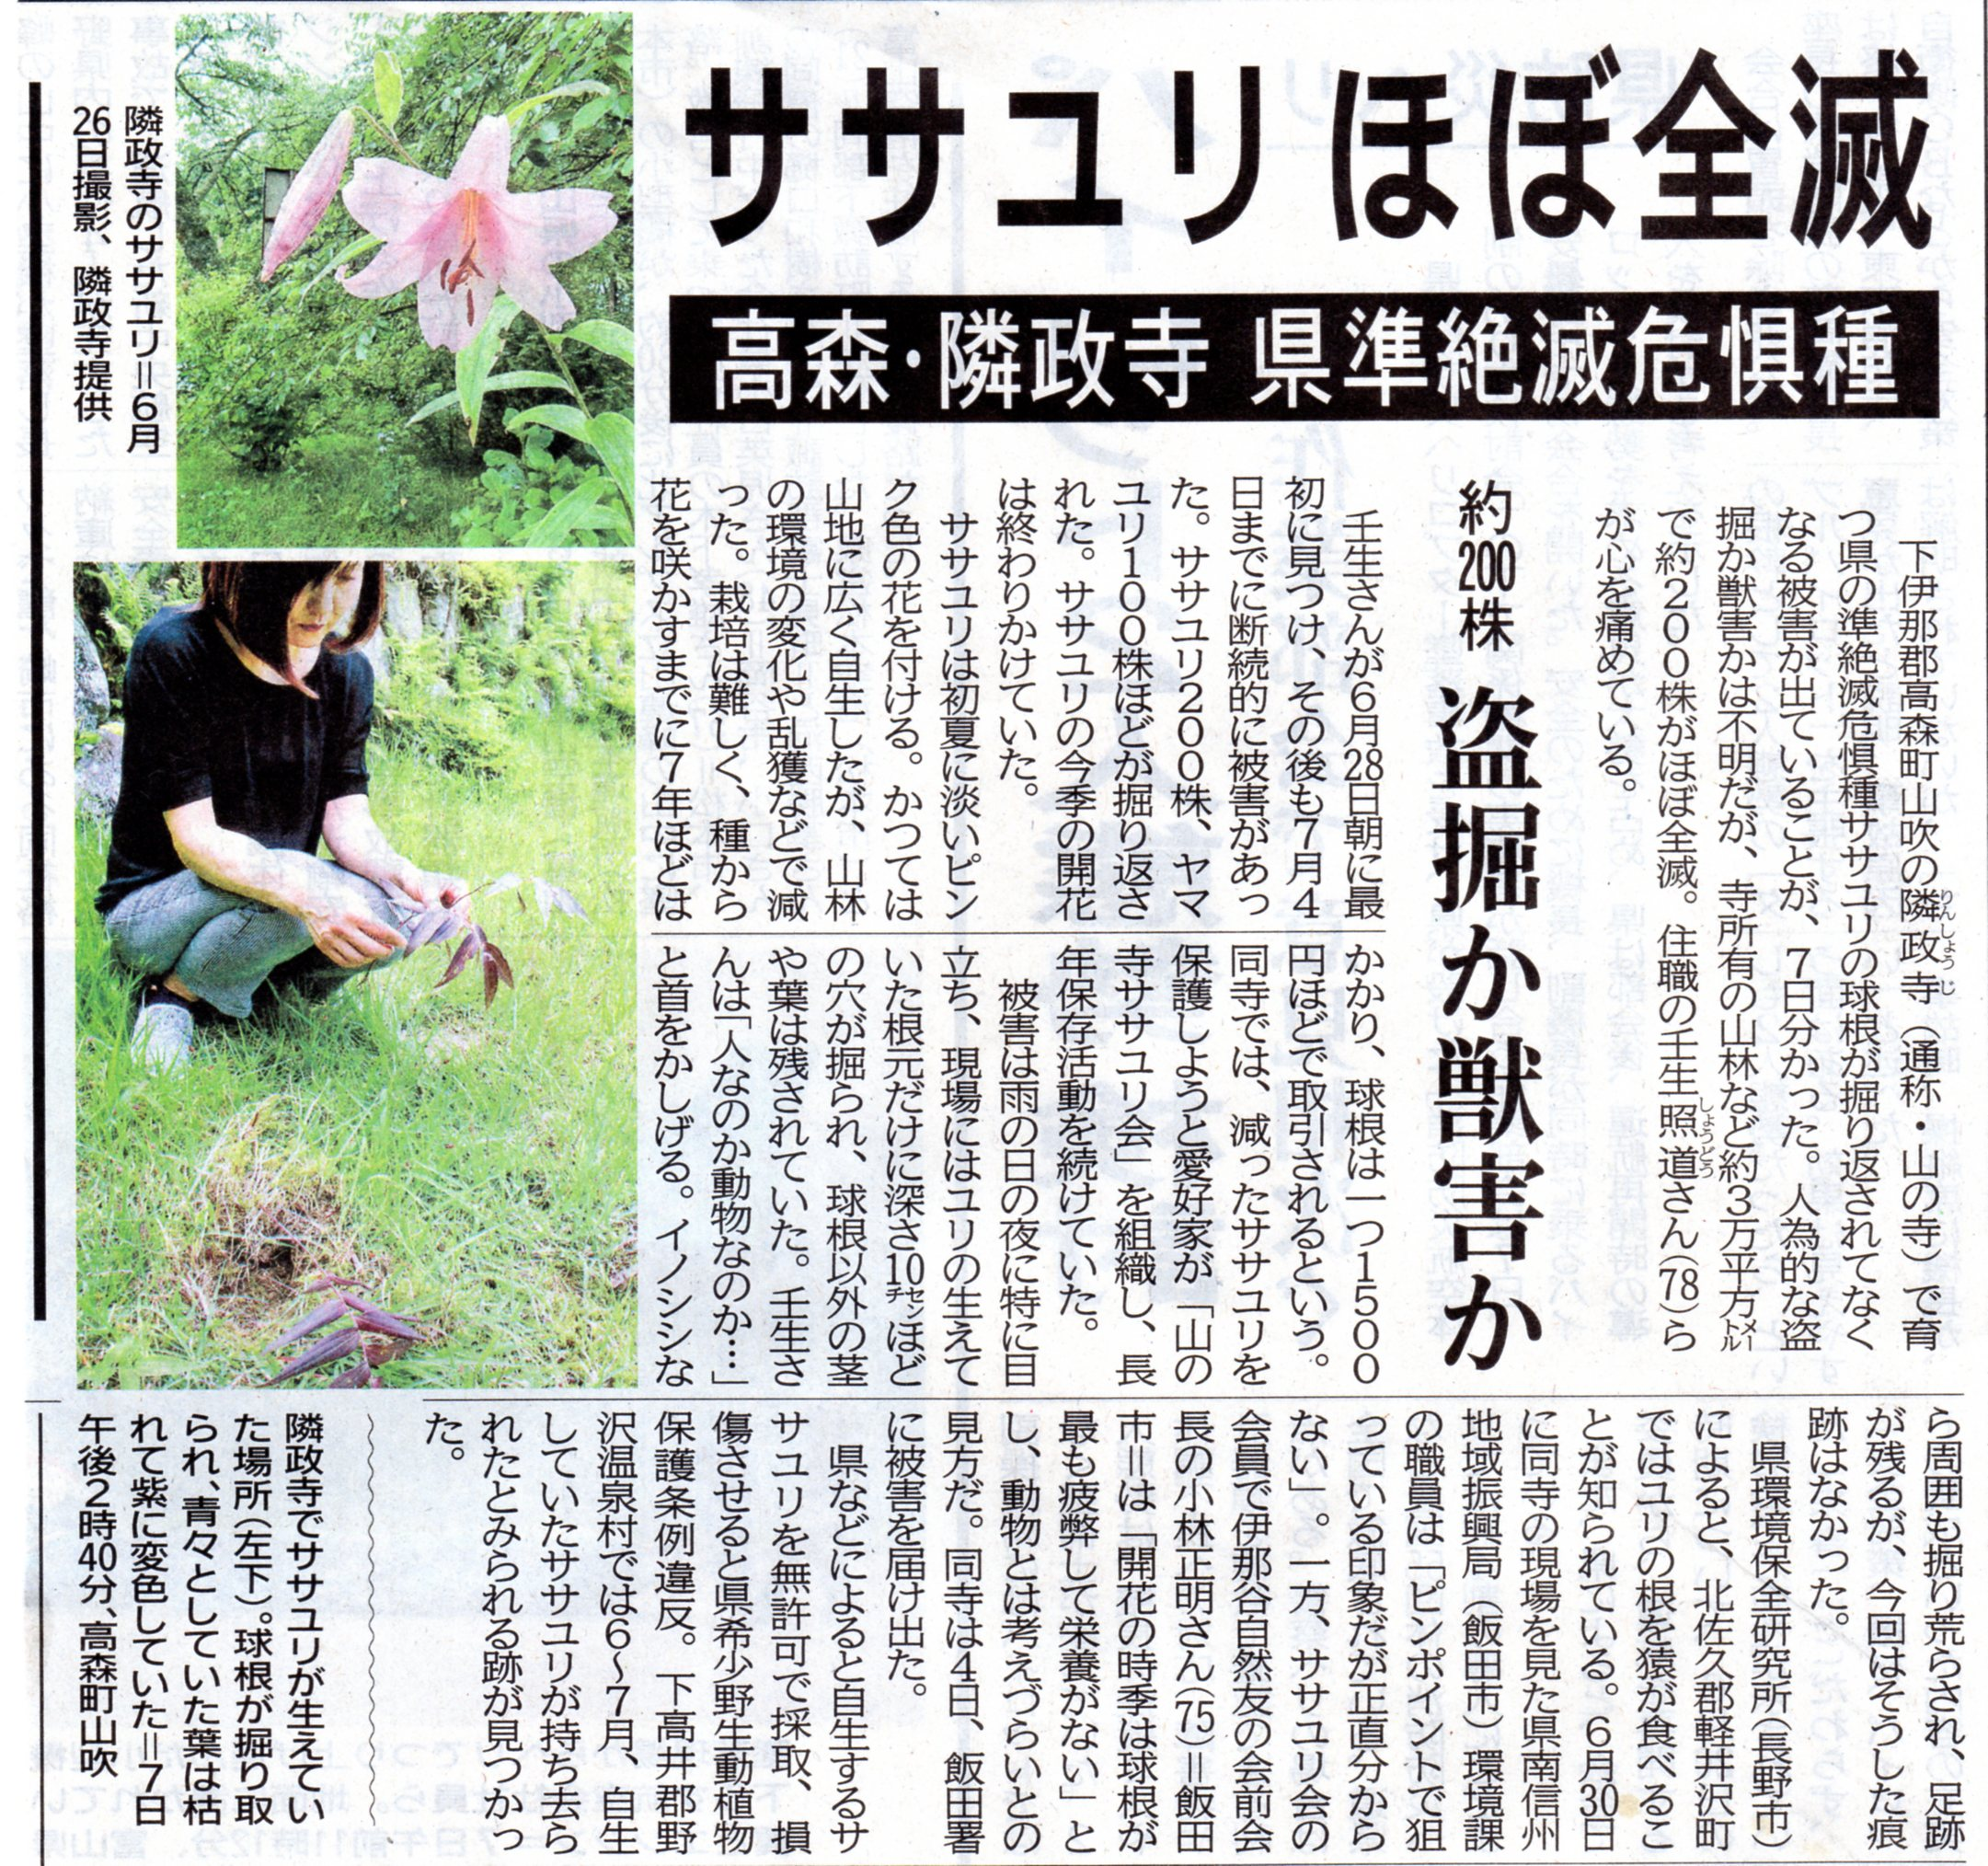 News_170713.jpg